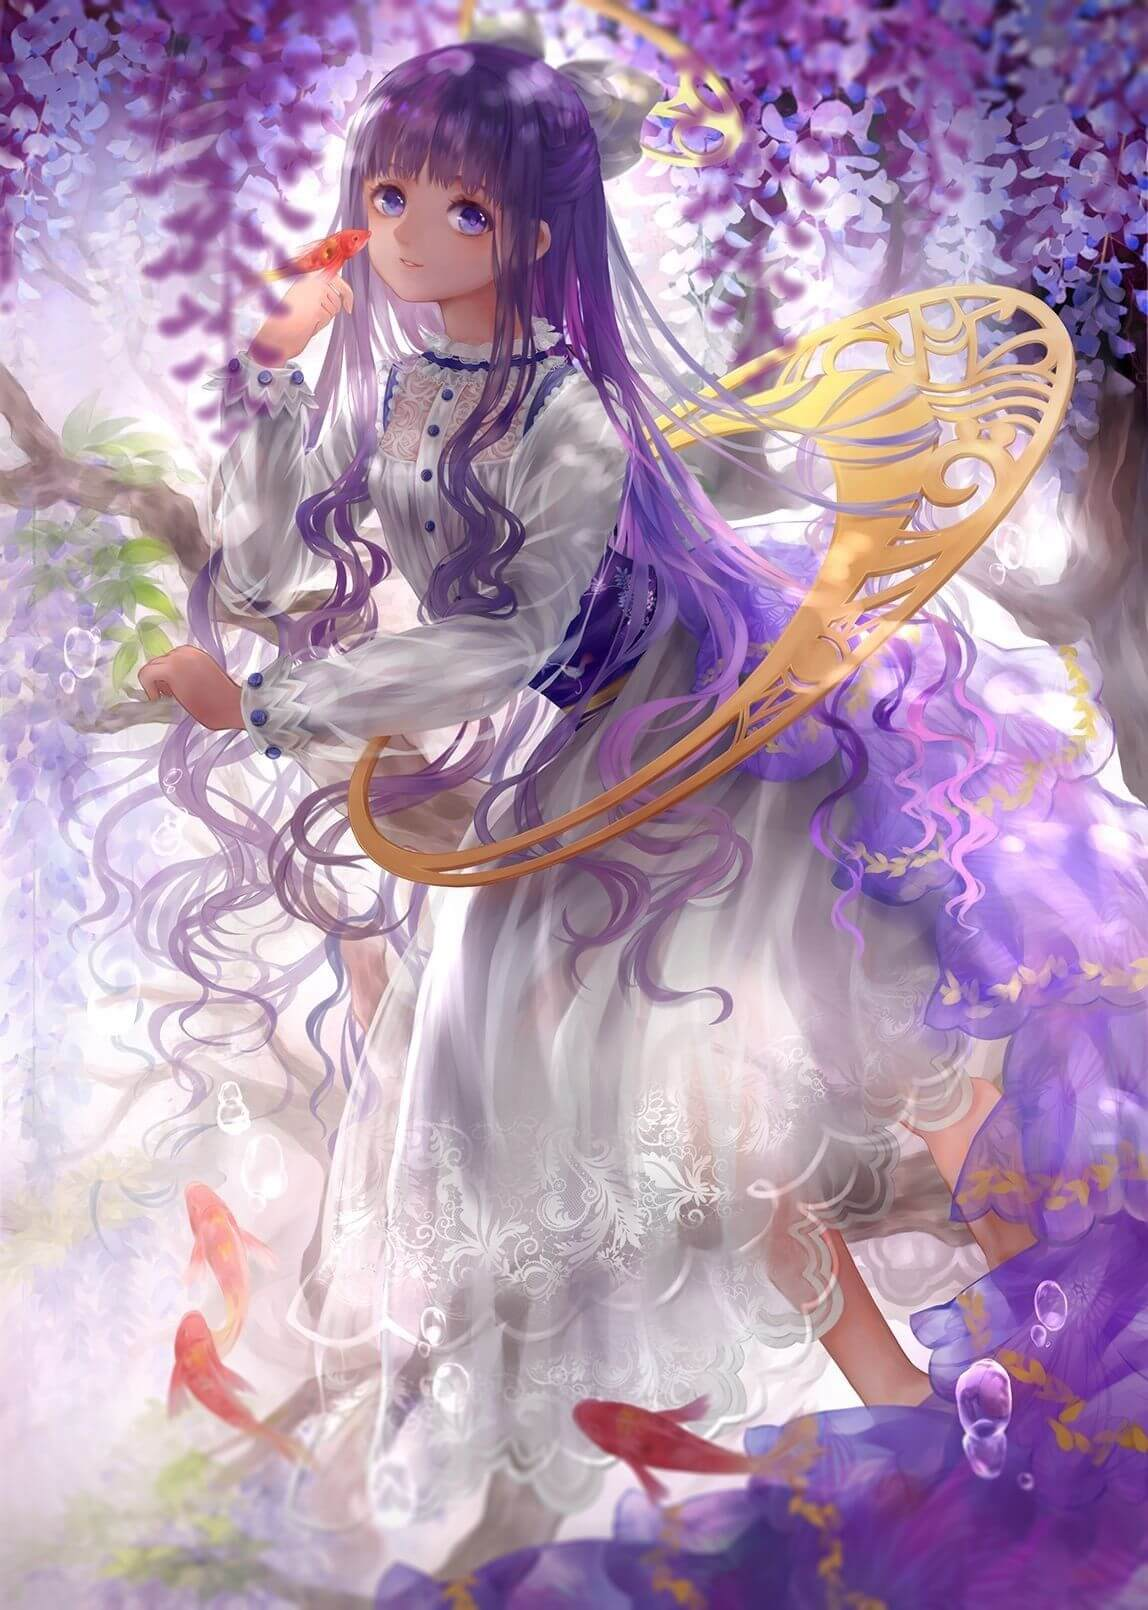 Anime nữ tóc tím dài